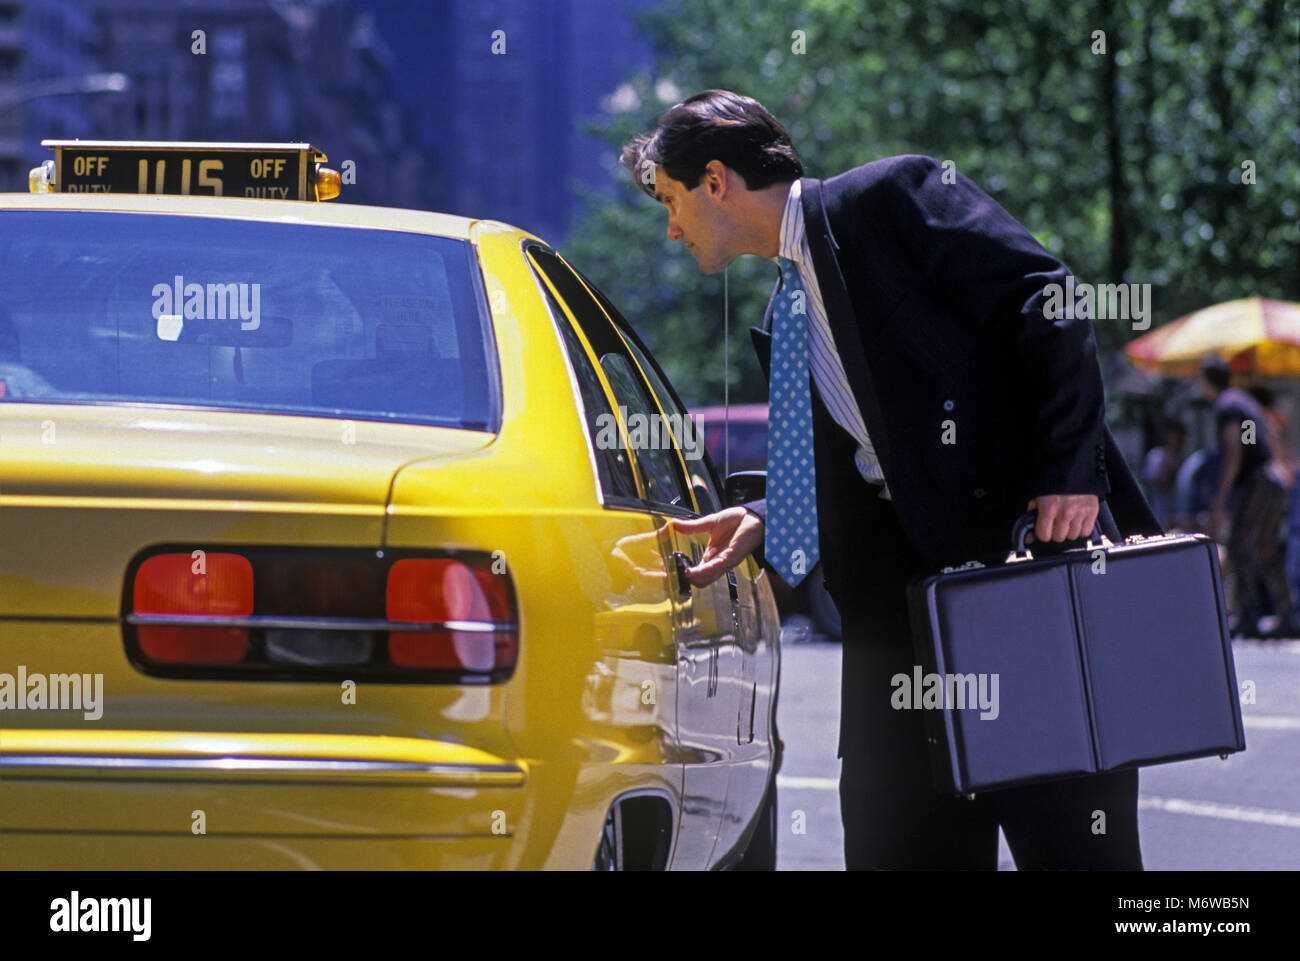 1994 Historical Caucasian Business Man At Door Of Yellow